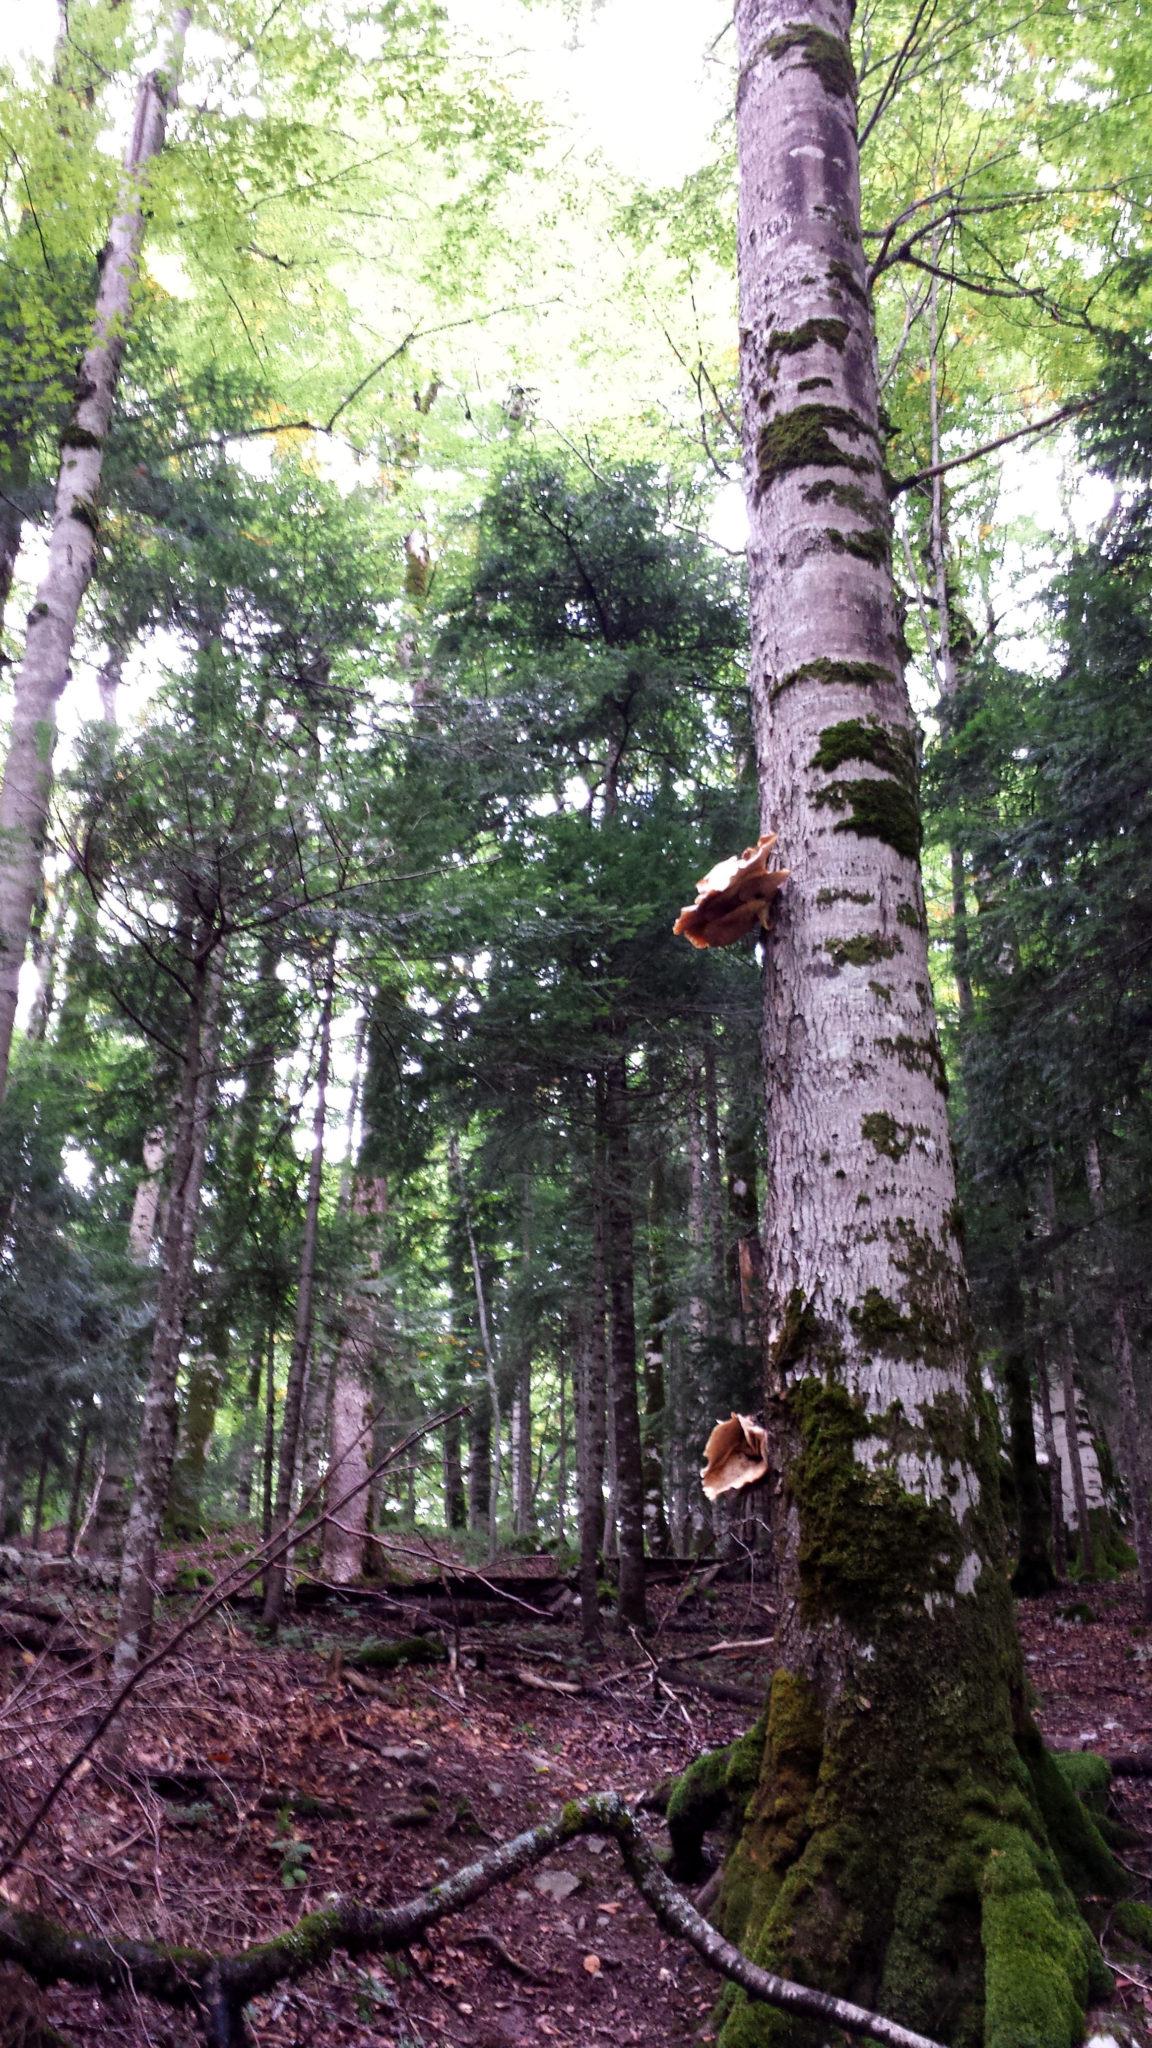 Hema_Montenegro_parc_national_biogradska_gora_forest_travel_voyage_blog8